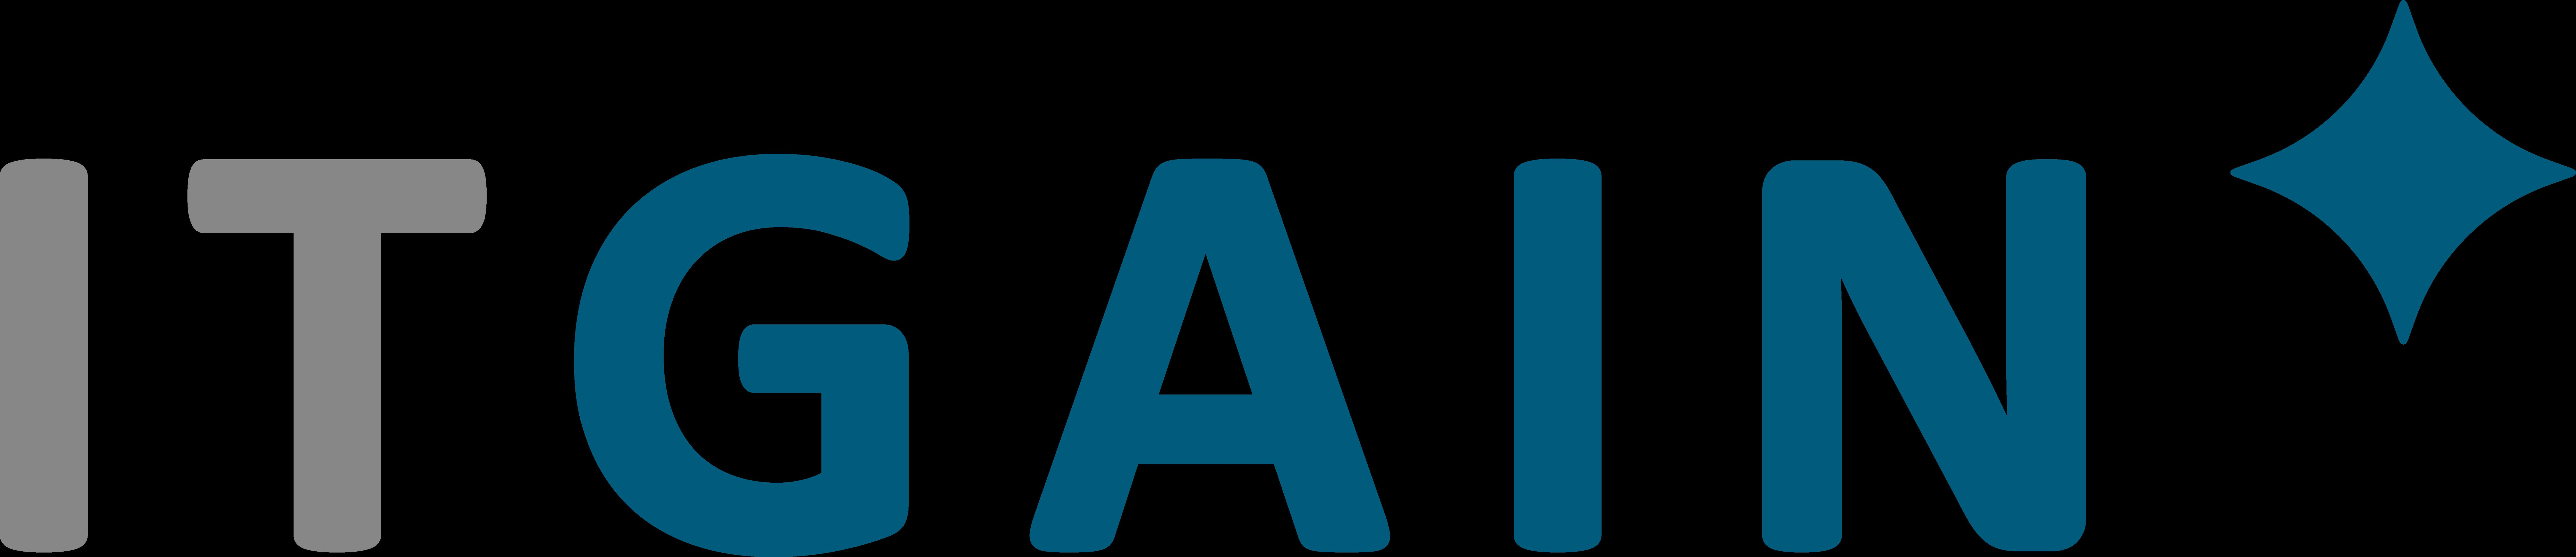 ITGAIN-Consulting-Gesellschaft-fur-IT-Beratung-mbH-logo